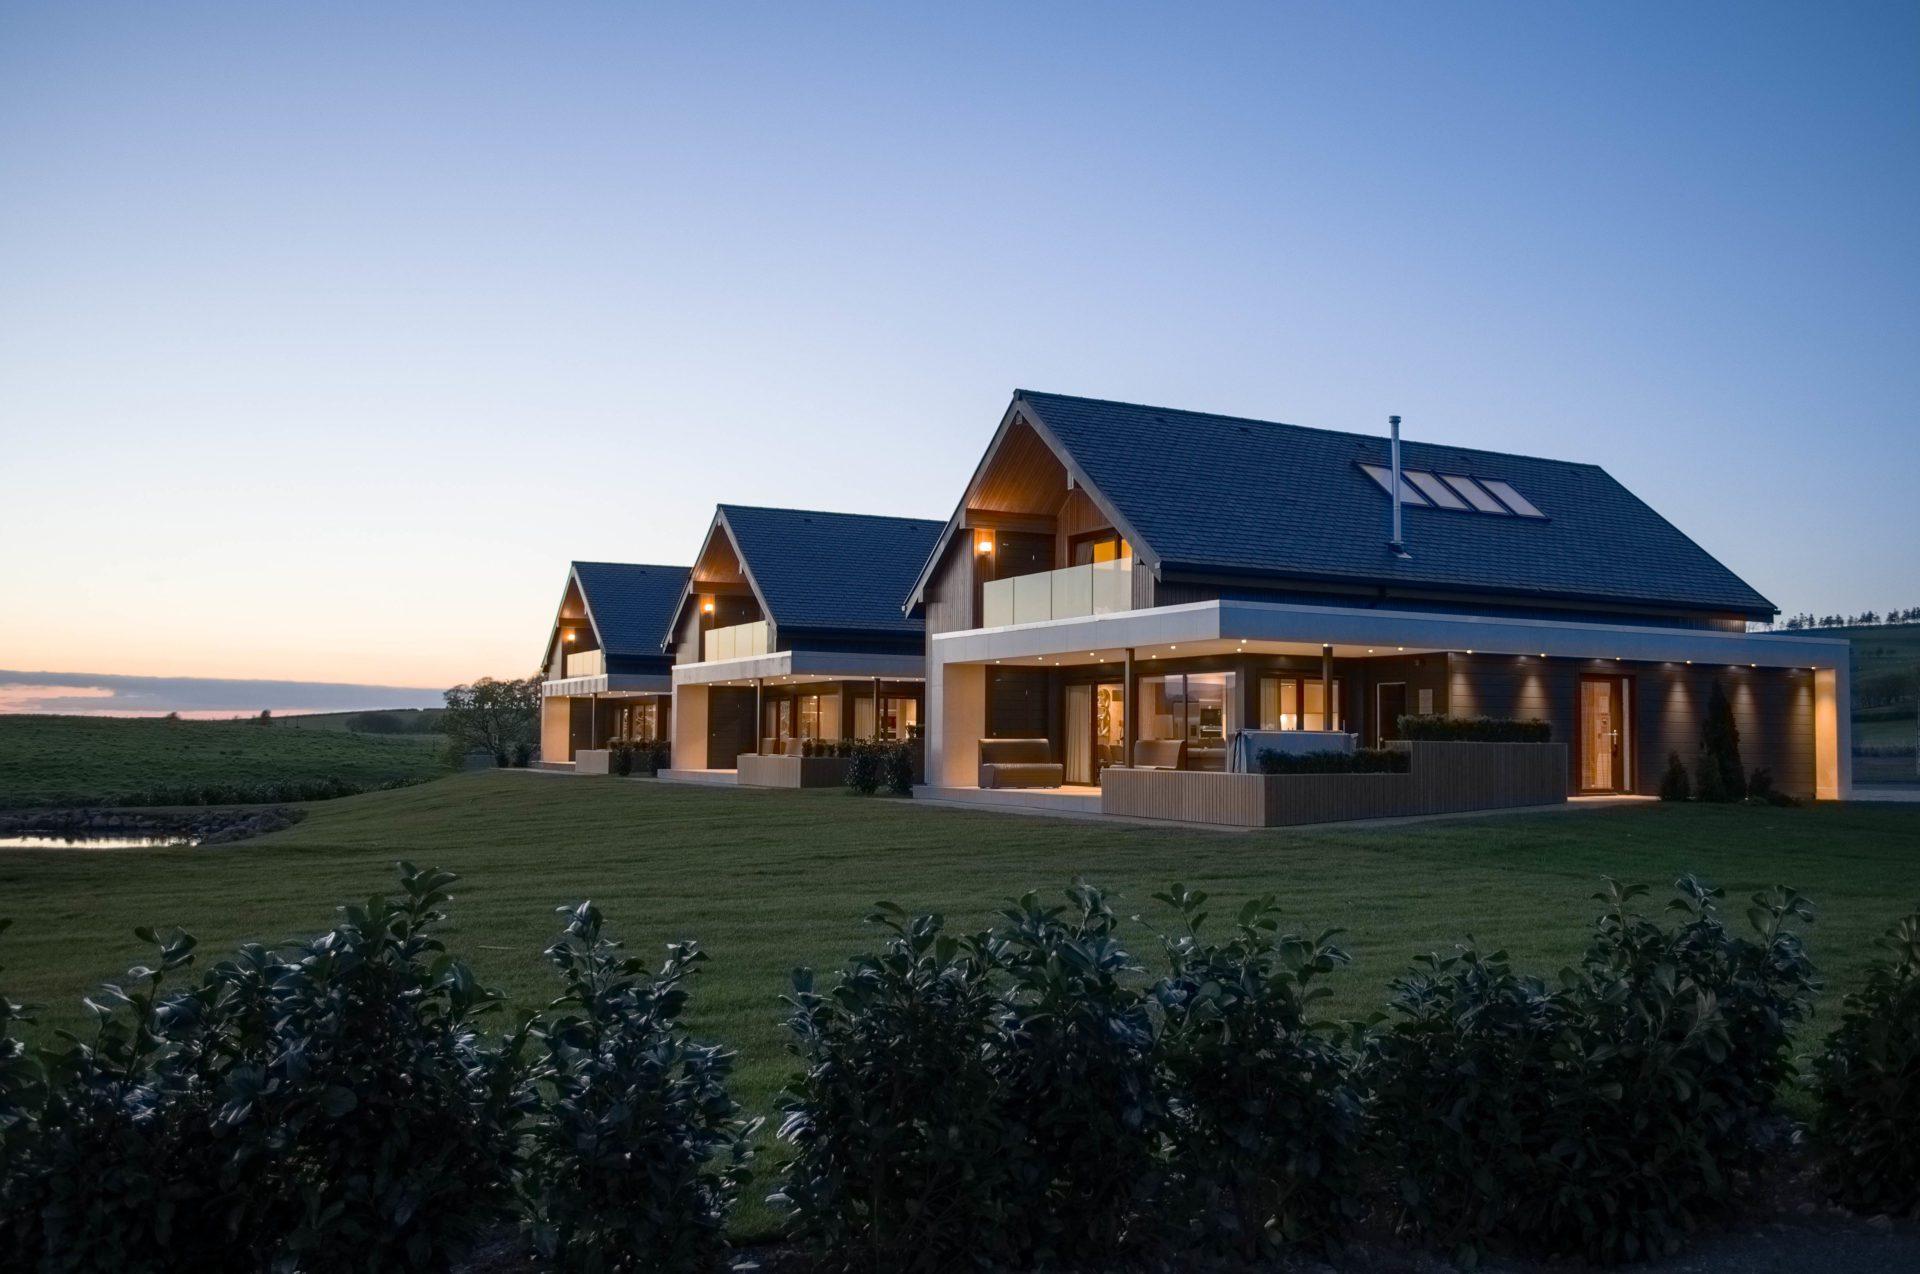 Lochside Lodges